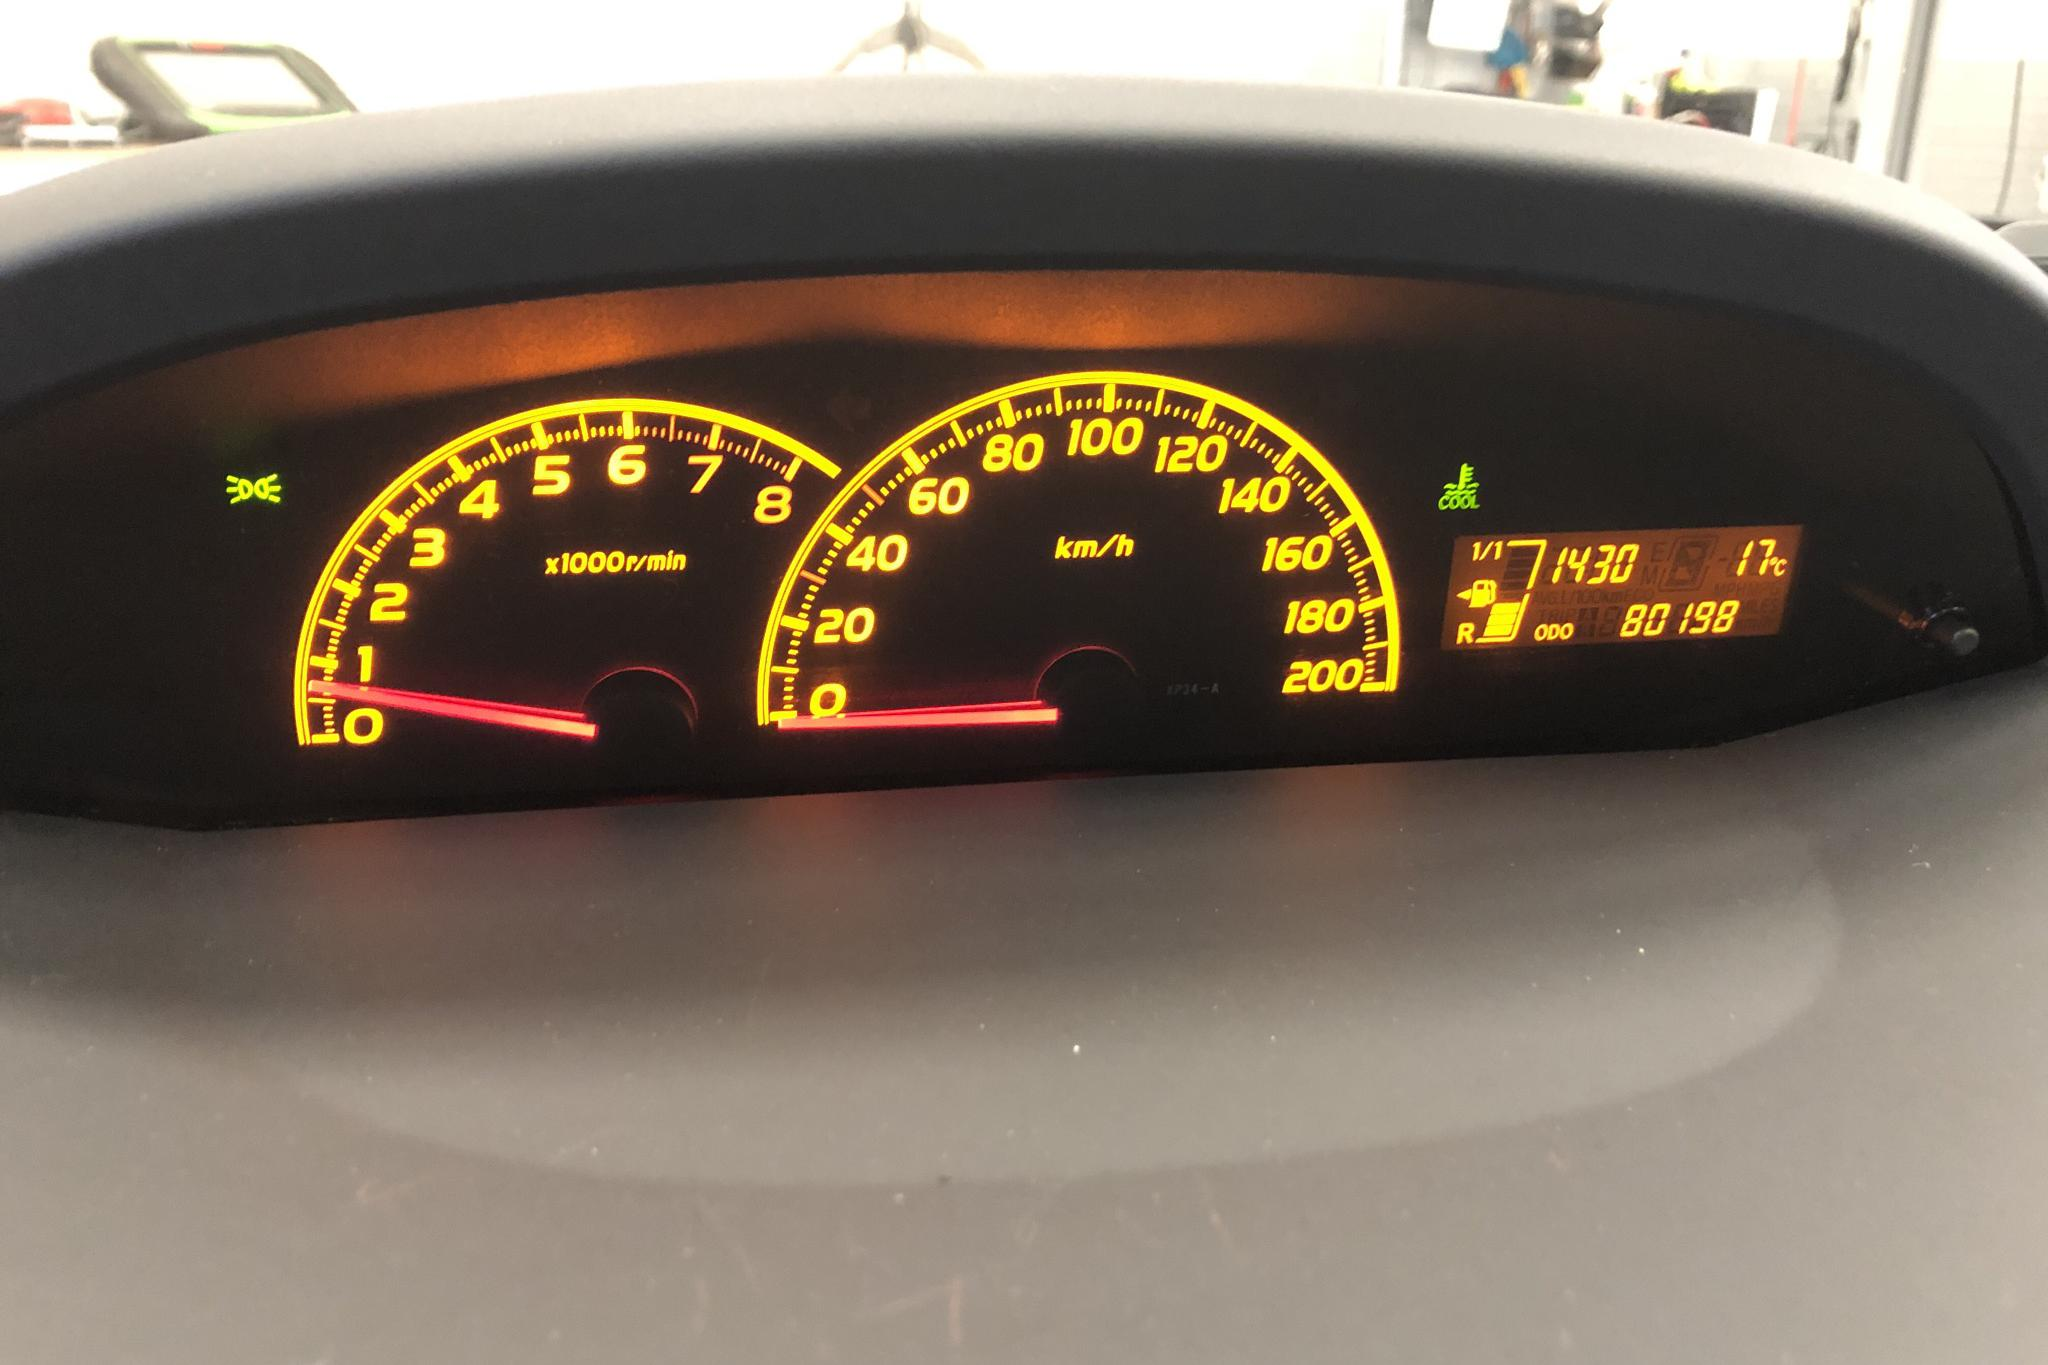 Toyota Yaris 1.33 5dr (100hk) - 8 020 mil - Manuell - silver - 2010